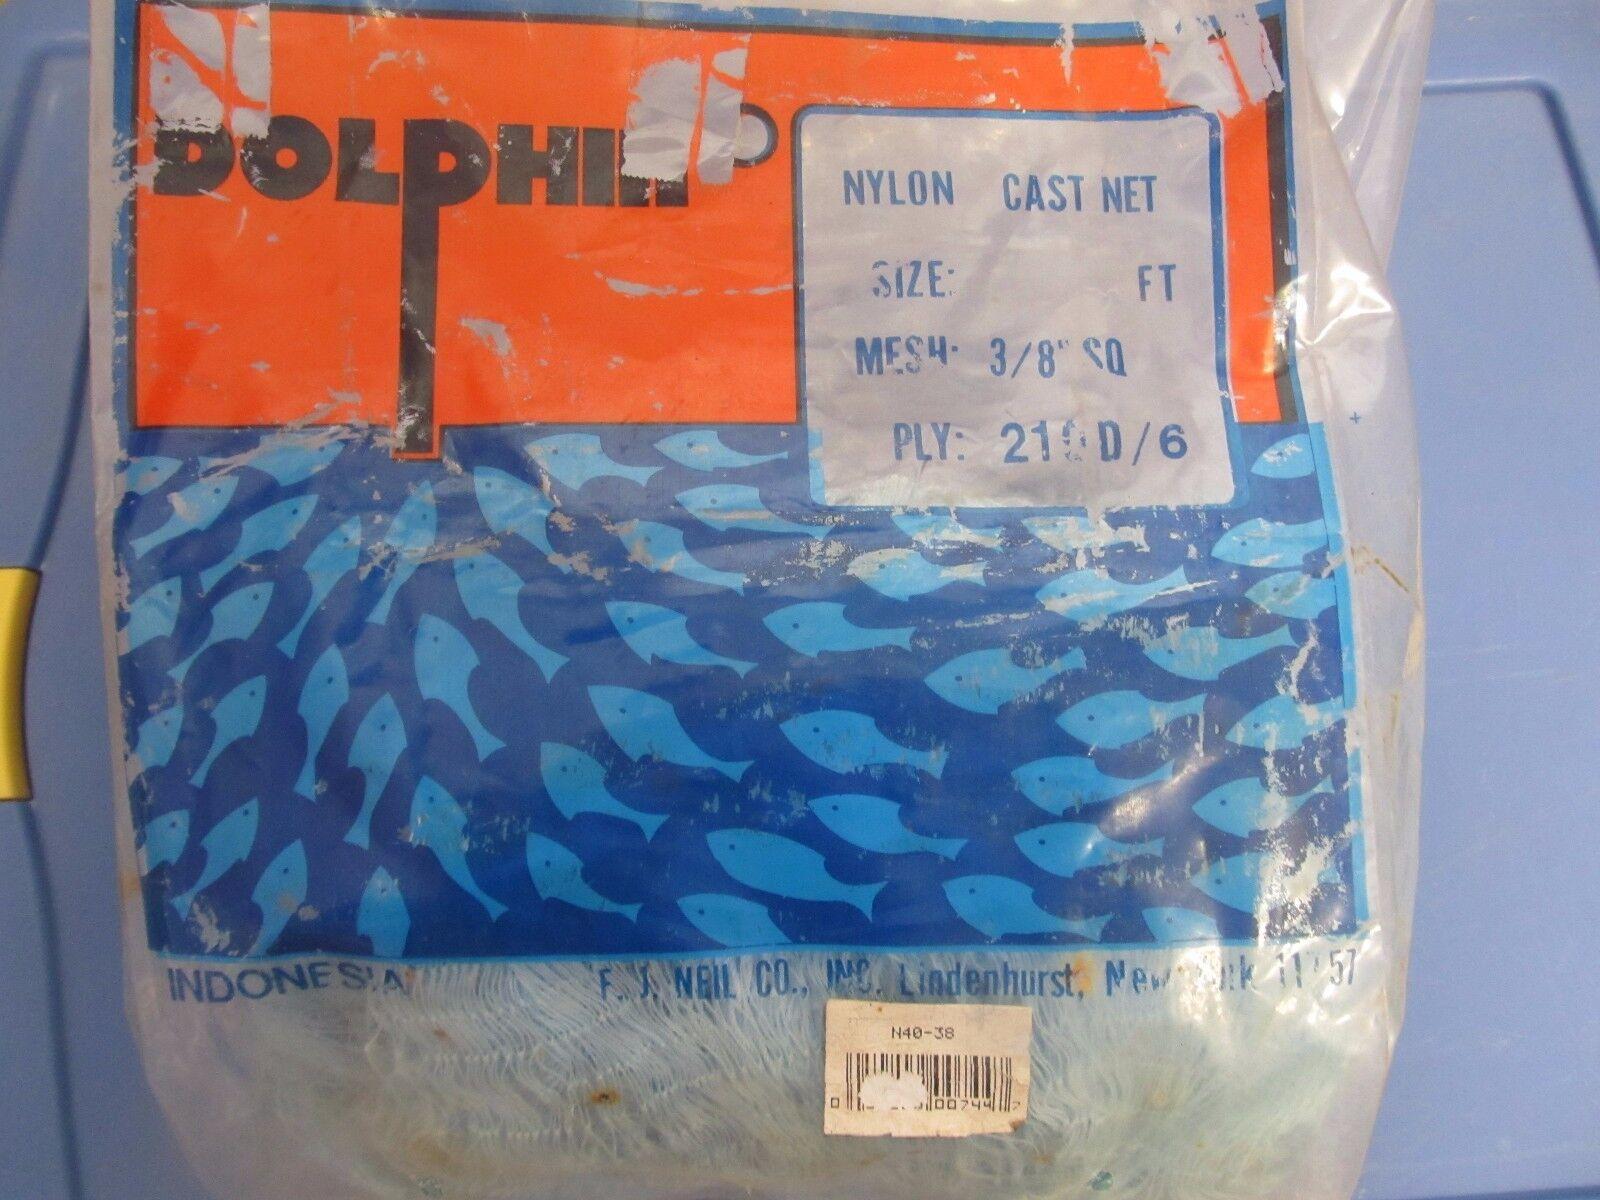 Dolphin Brand Nylon Cast Net 3 8  Sq Mesh  4' Radius